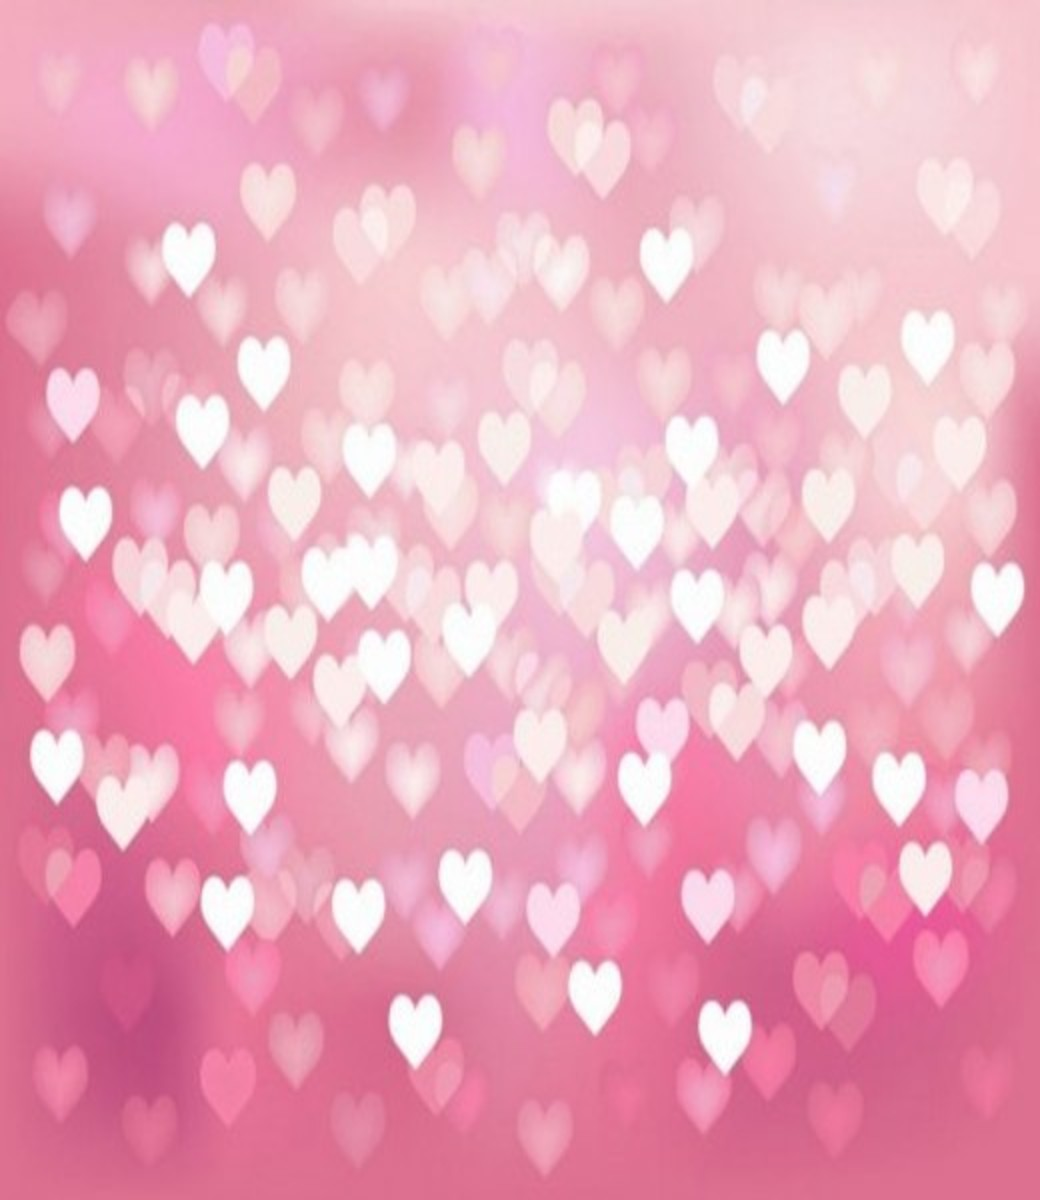 Pastel Hearts Wallpaper